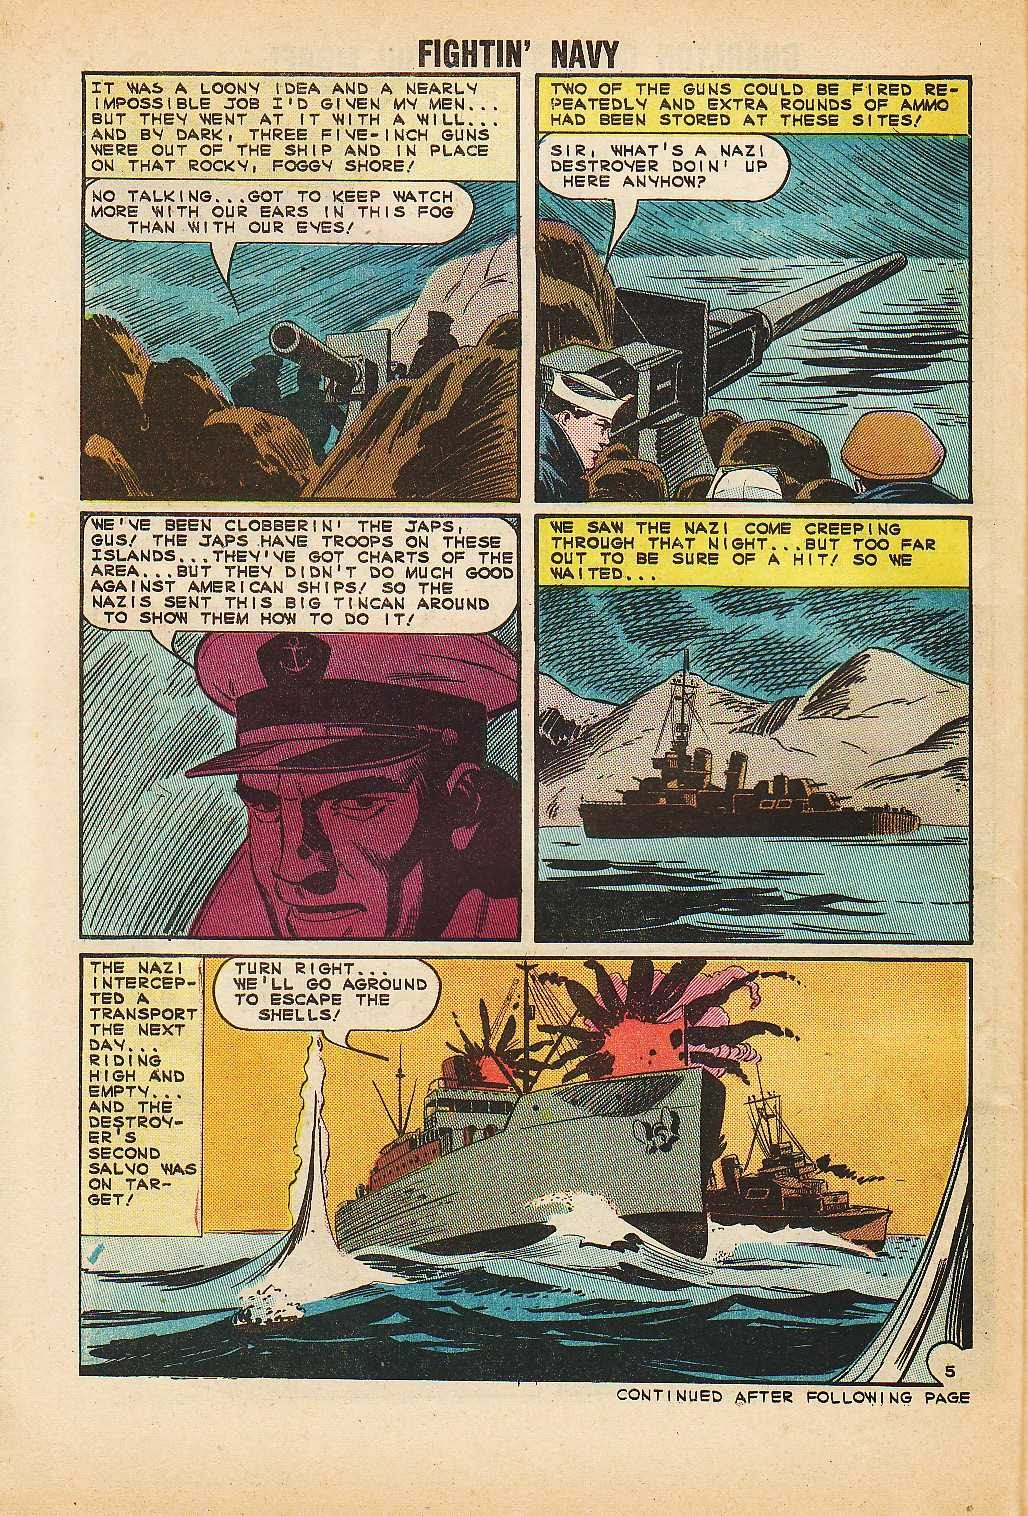 Read online Fightin' Navy comic -  Issue #116 - 30